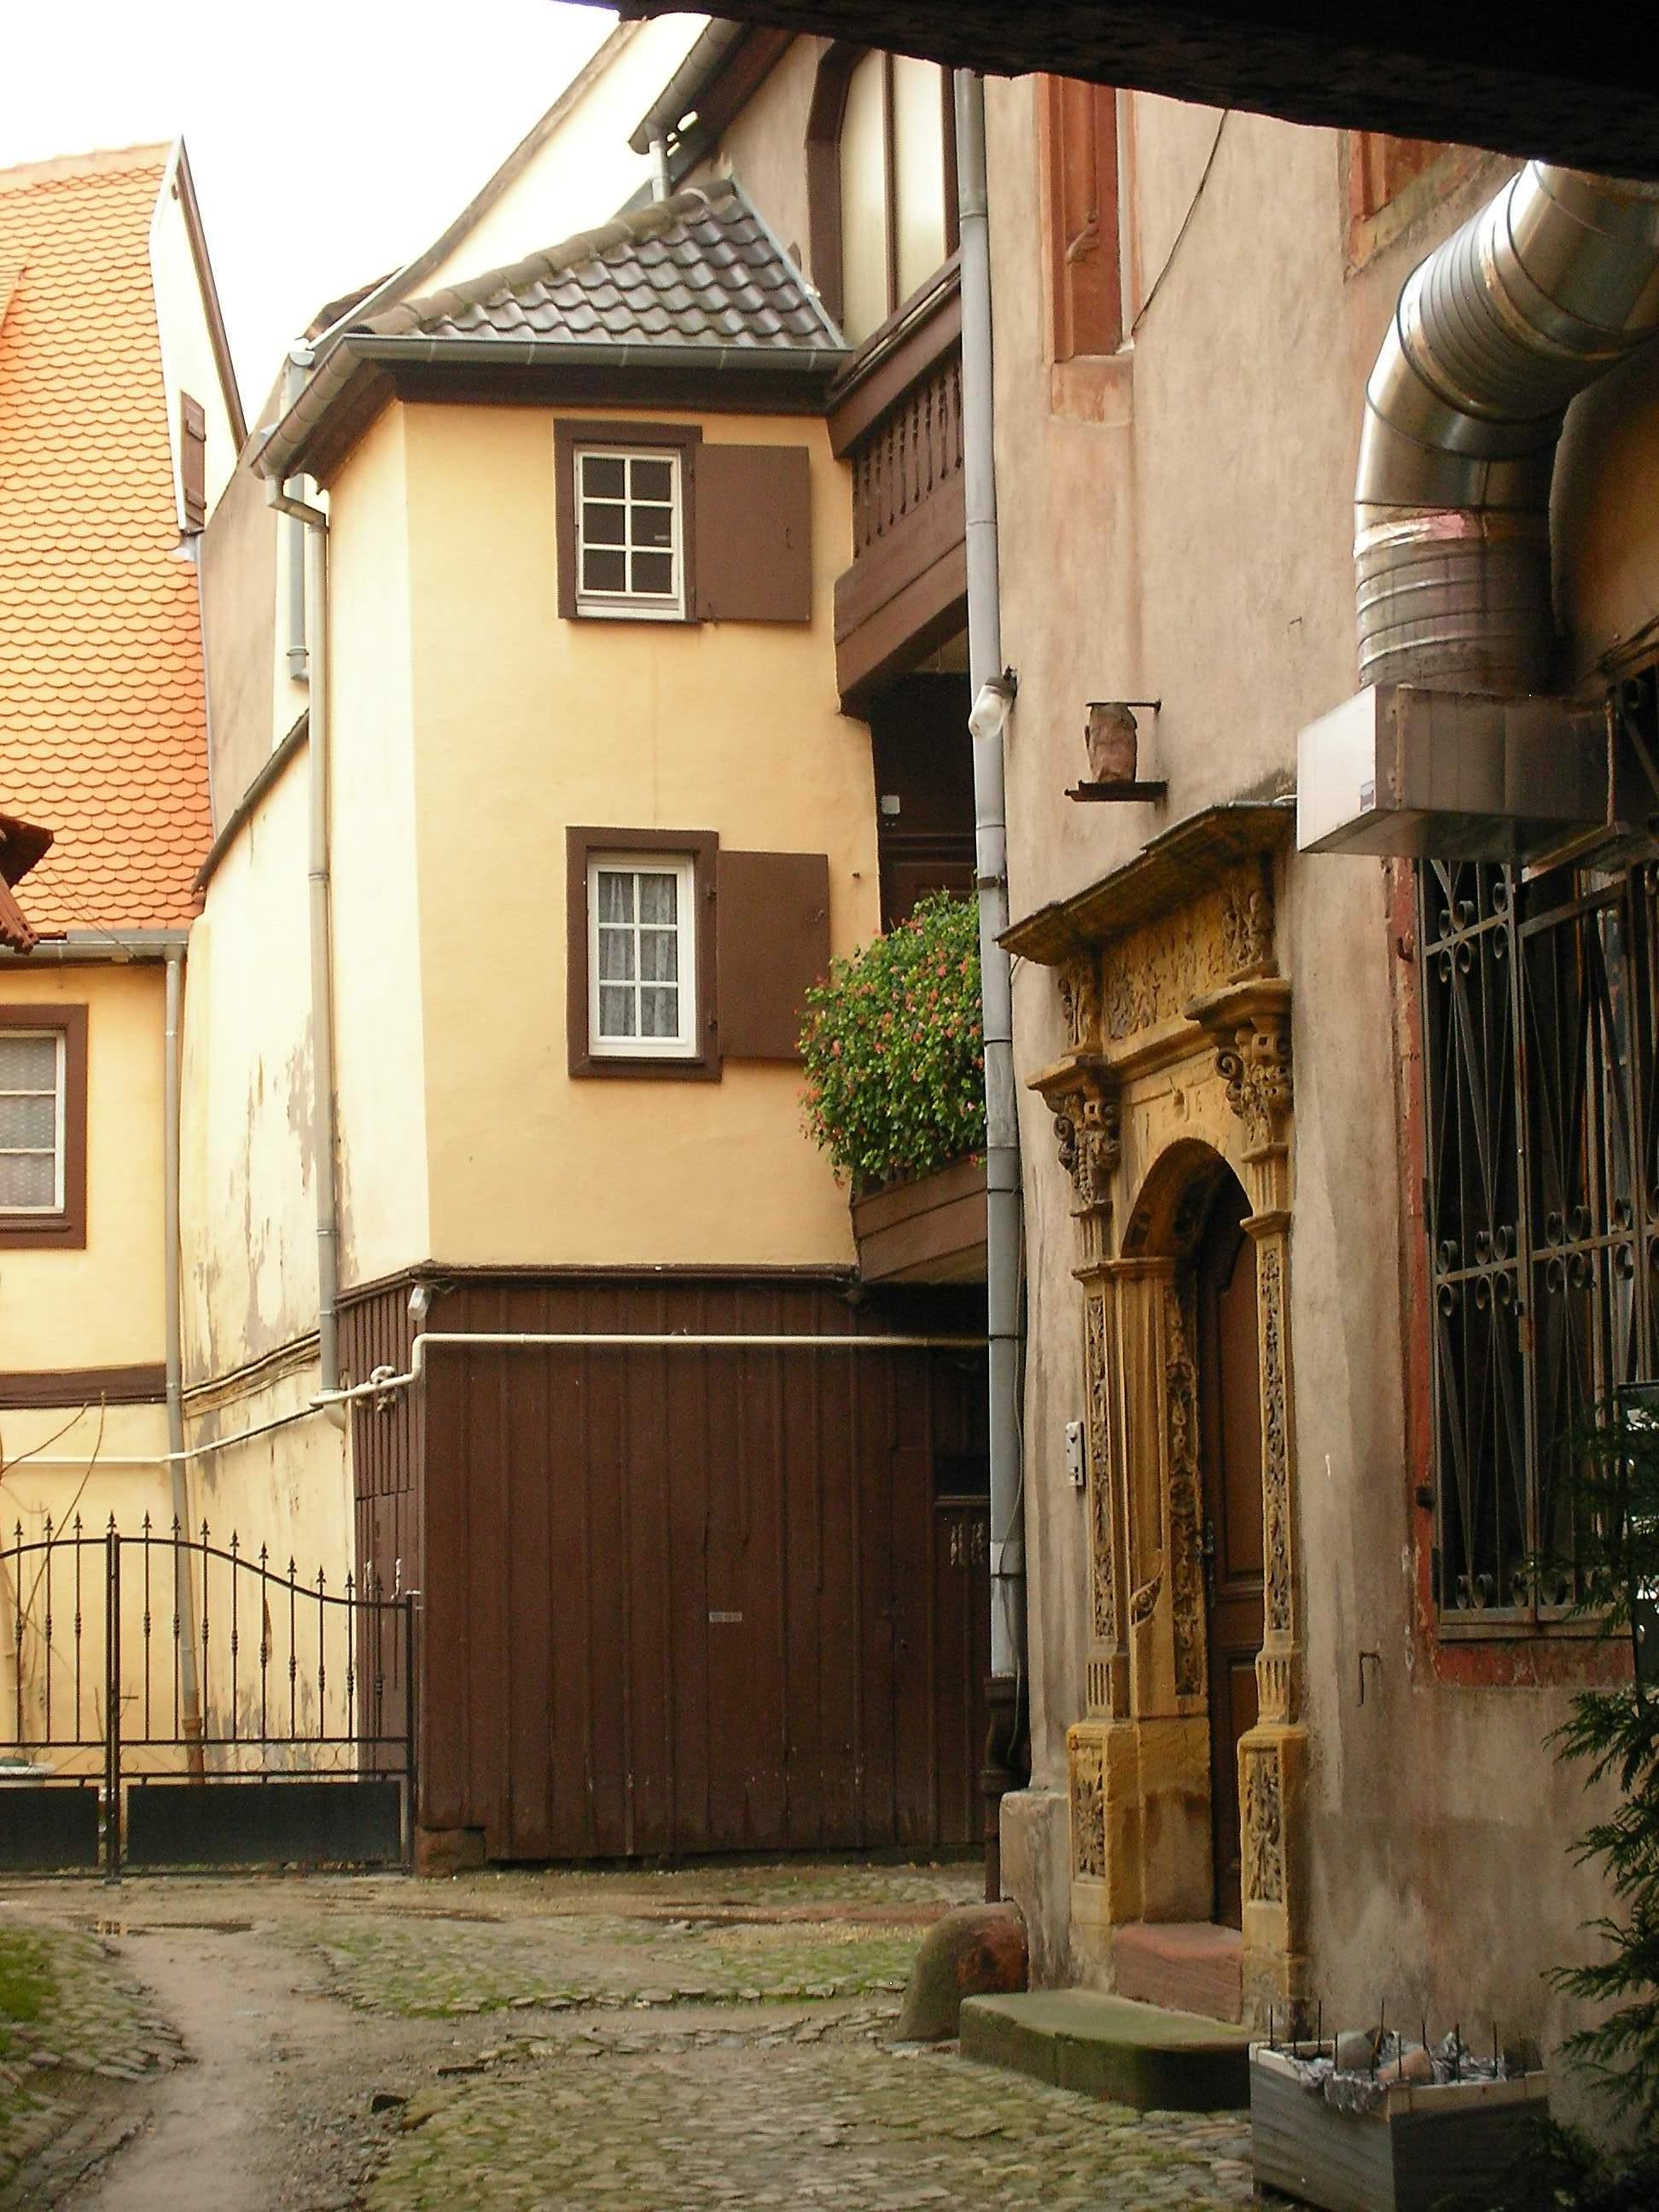 Datei:Colmar Maison cour intérieure (15 rue Berthe-Molly).jpg ...